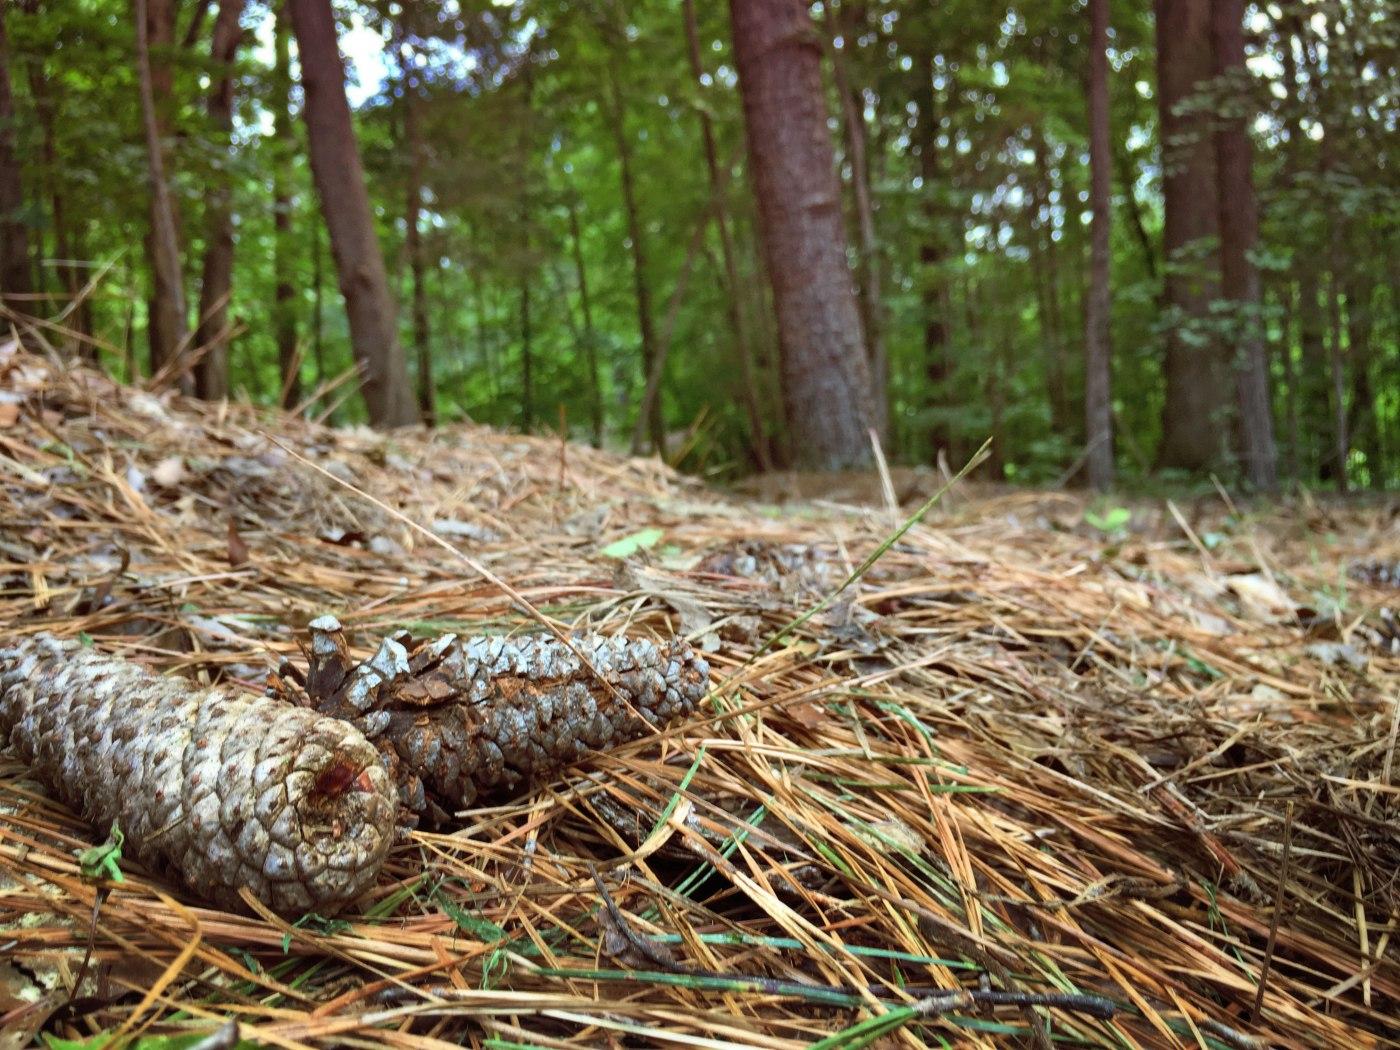 Pine Cones & Pine Straw